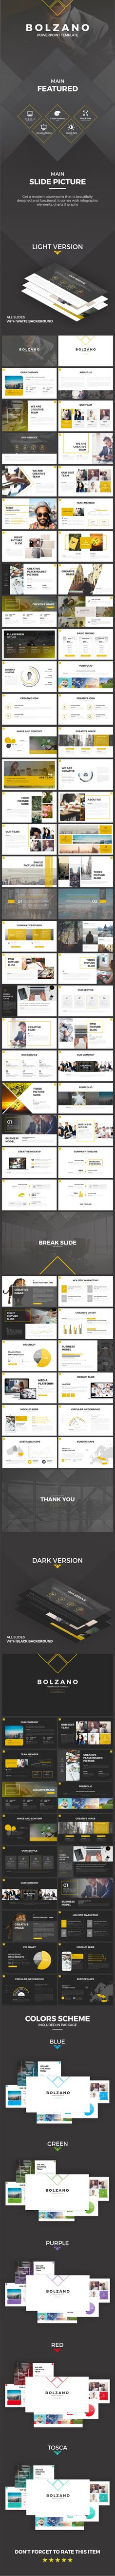 Bolzano - PowerPoint Presentation Template - 69 Slides